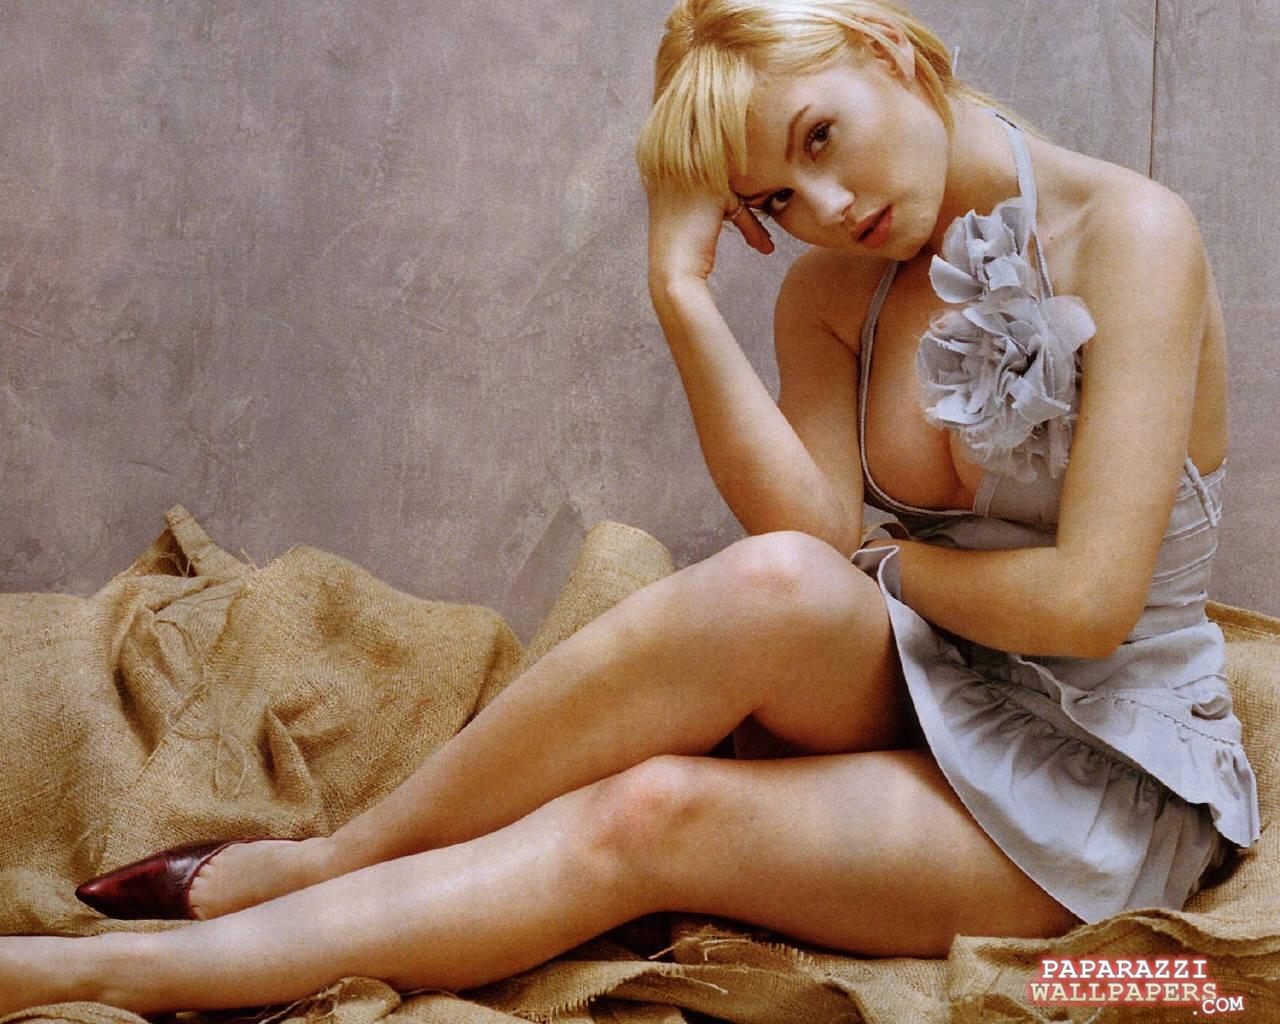 http://www.paparazziwallpapers.com/data/media/11/elisha_cuthbert_wallpapers_063.jpg